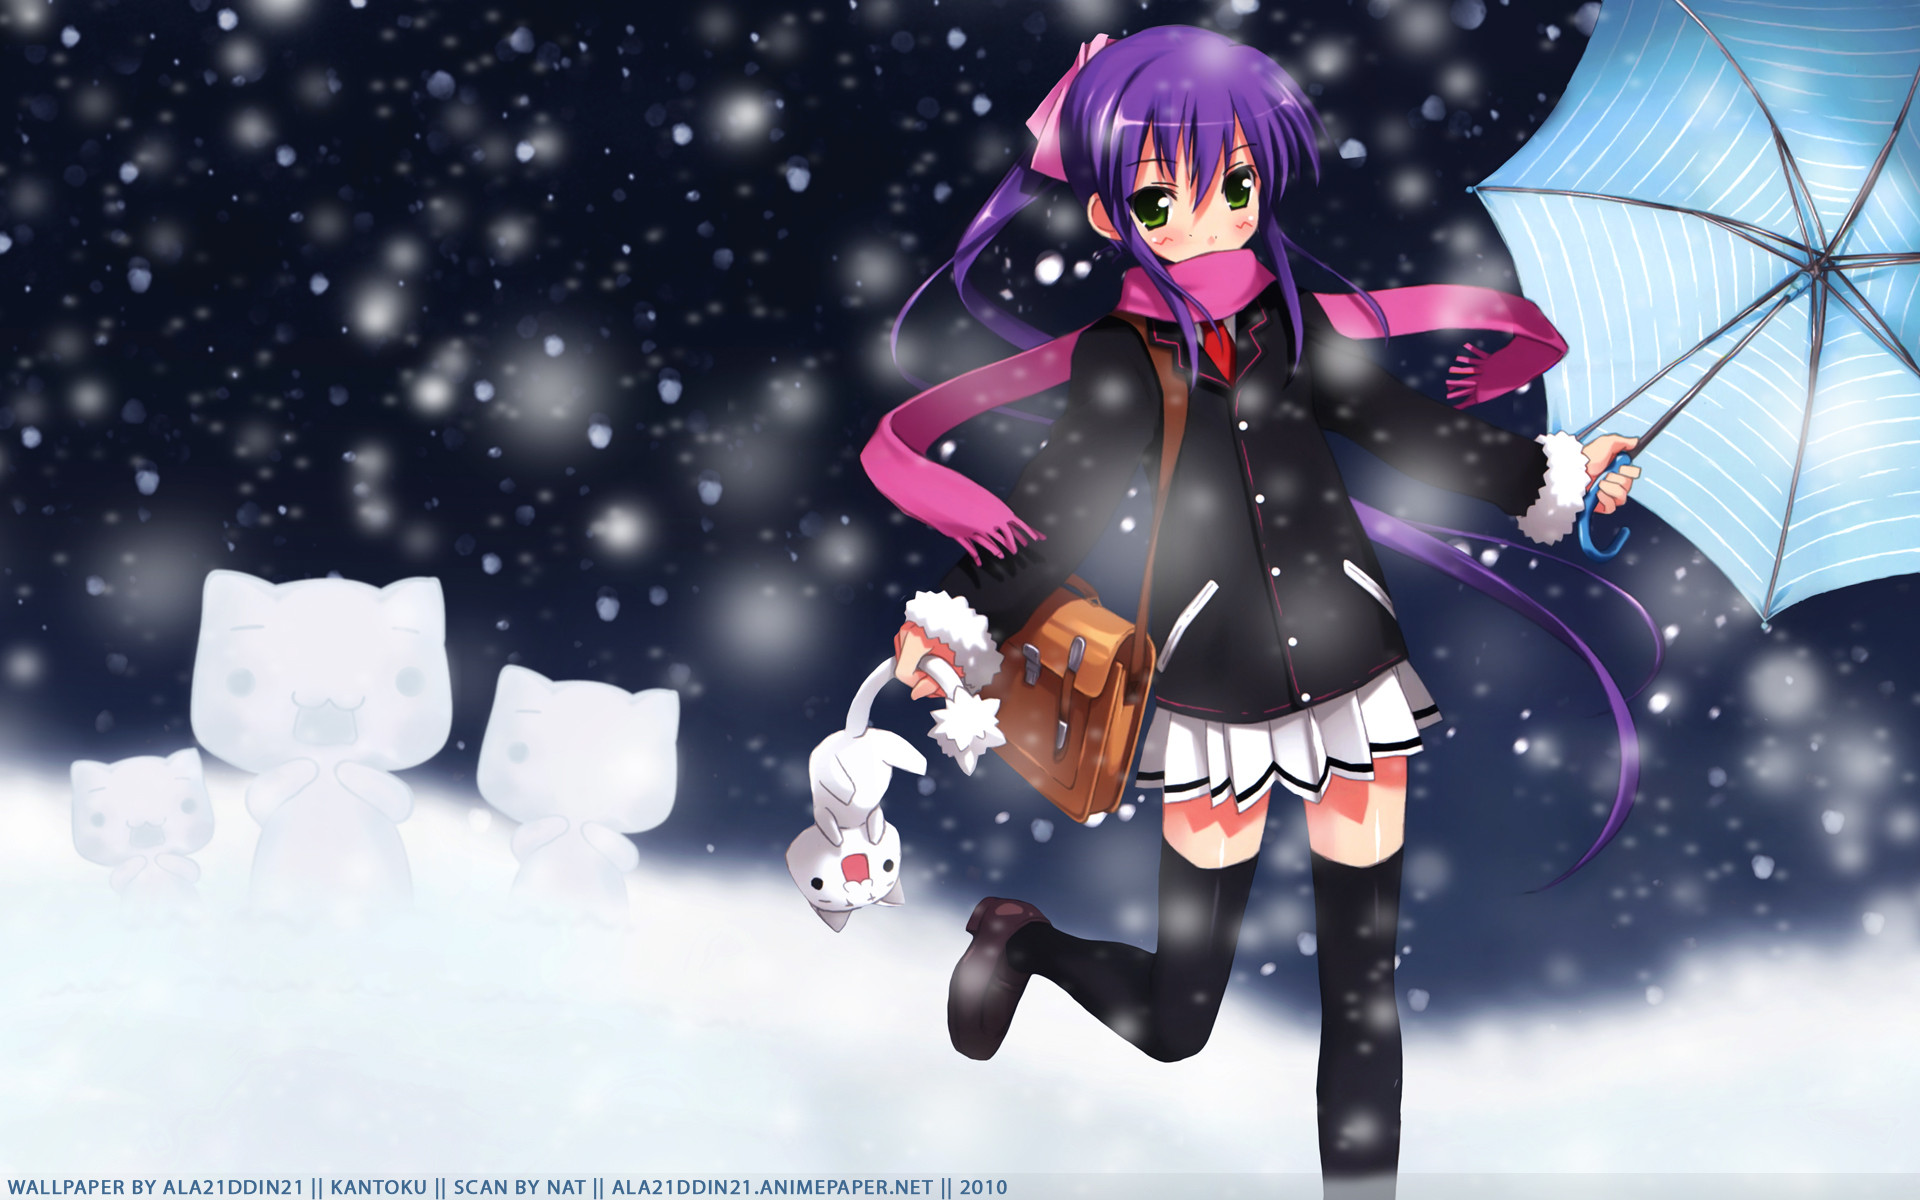 Anime 1920x1200 anime girls anime umbrella 2010 (Year) purple hair green eyes miniskirt